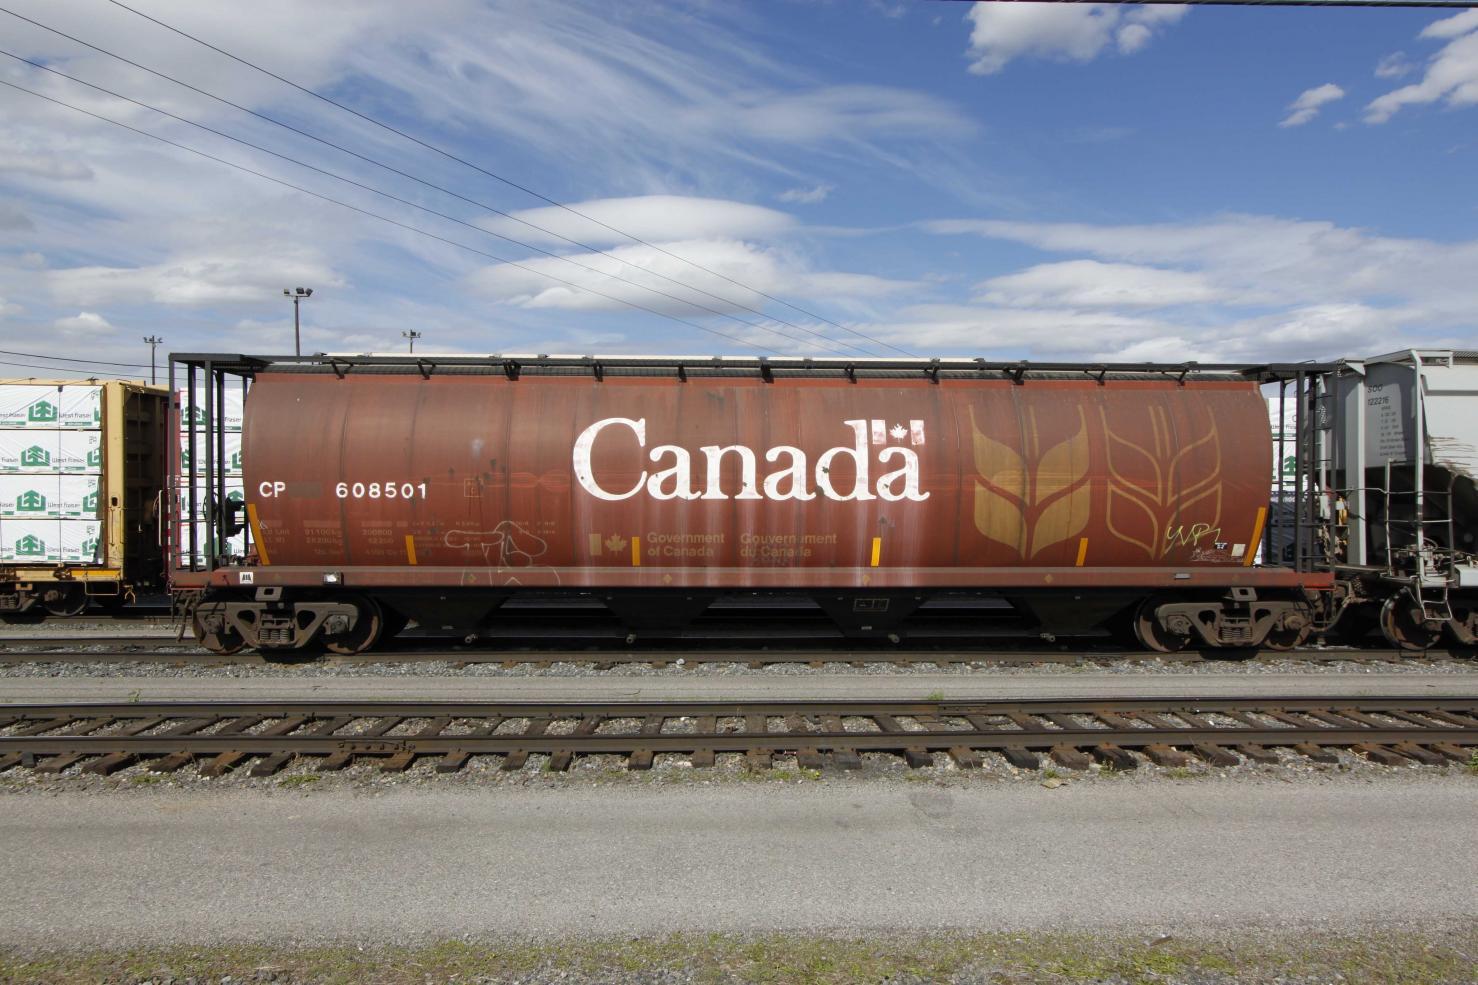 Canada Hopper.jpg